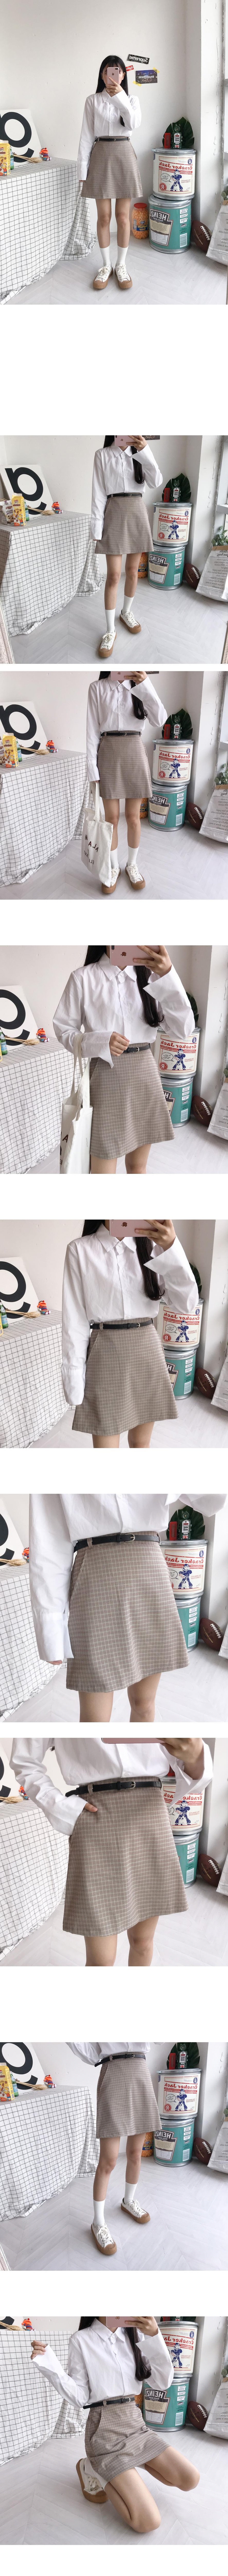 Big Cuffs Basic Shirt